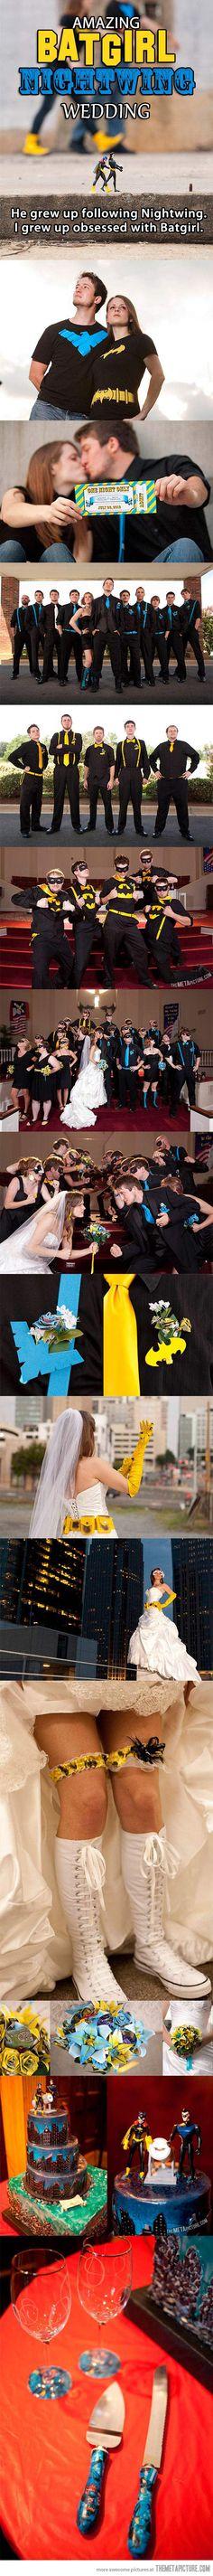 Bat casamento